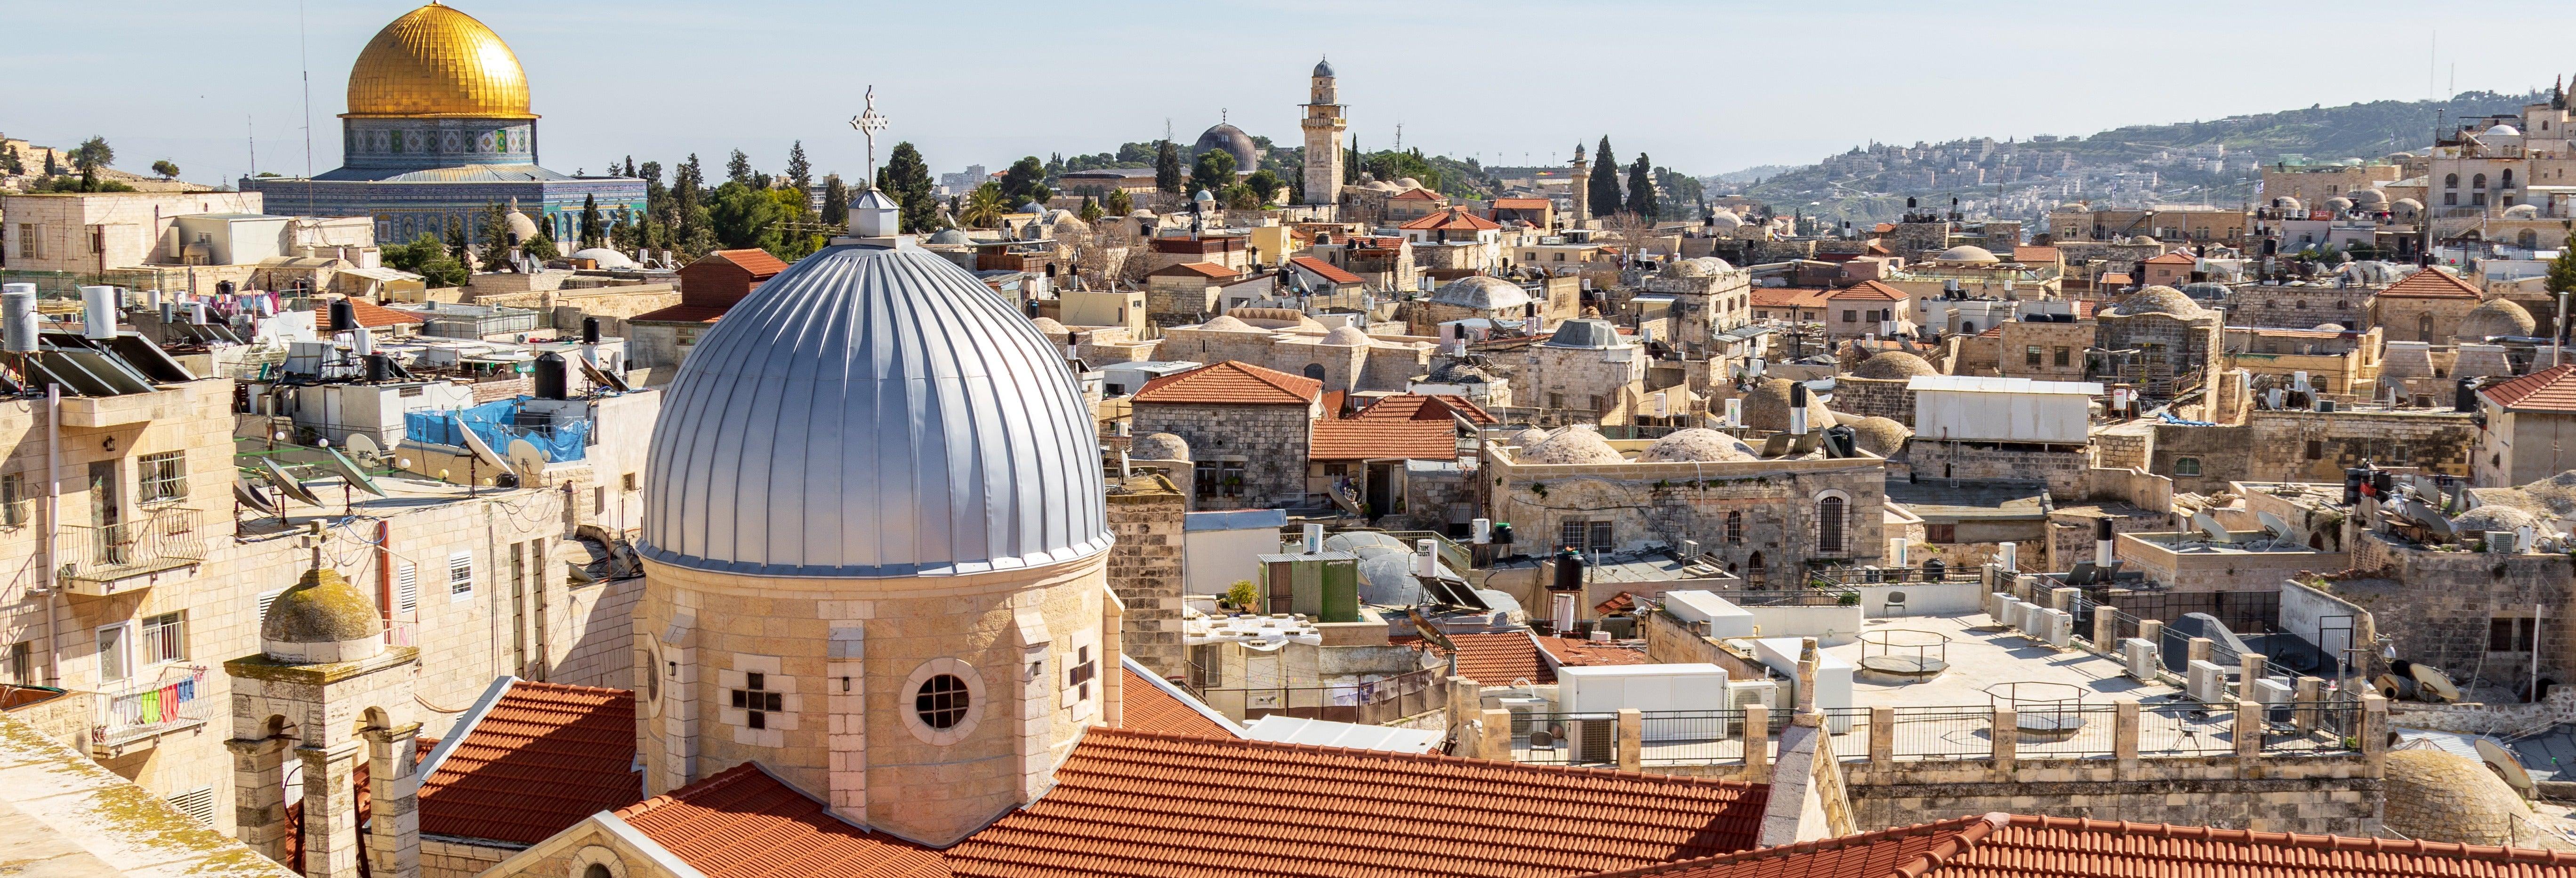 Visita guidata di Gerusalemme